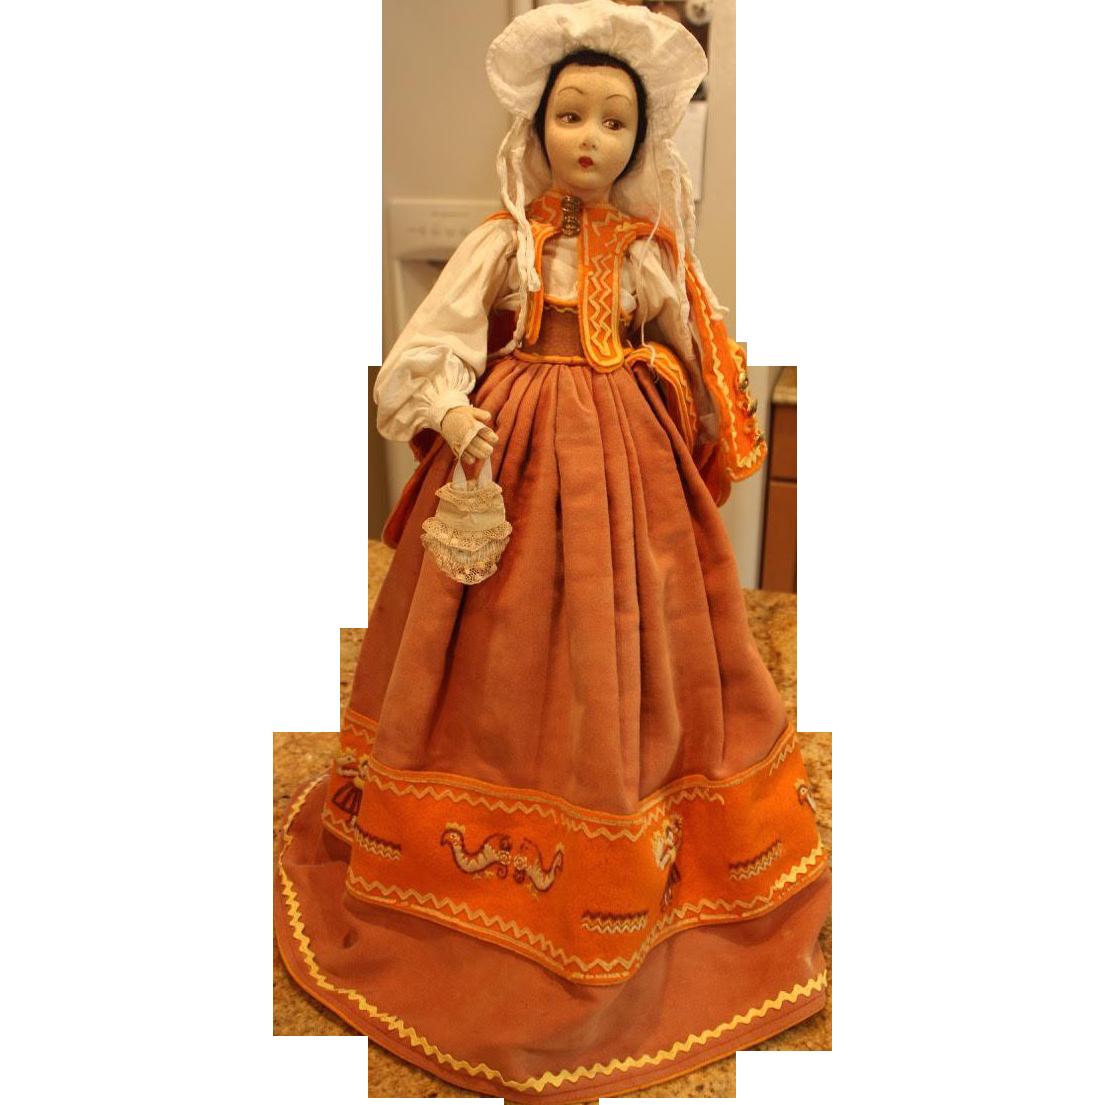 Lenci Vintage collectible felt Cloth boudoir doll 24 inches